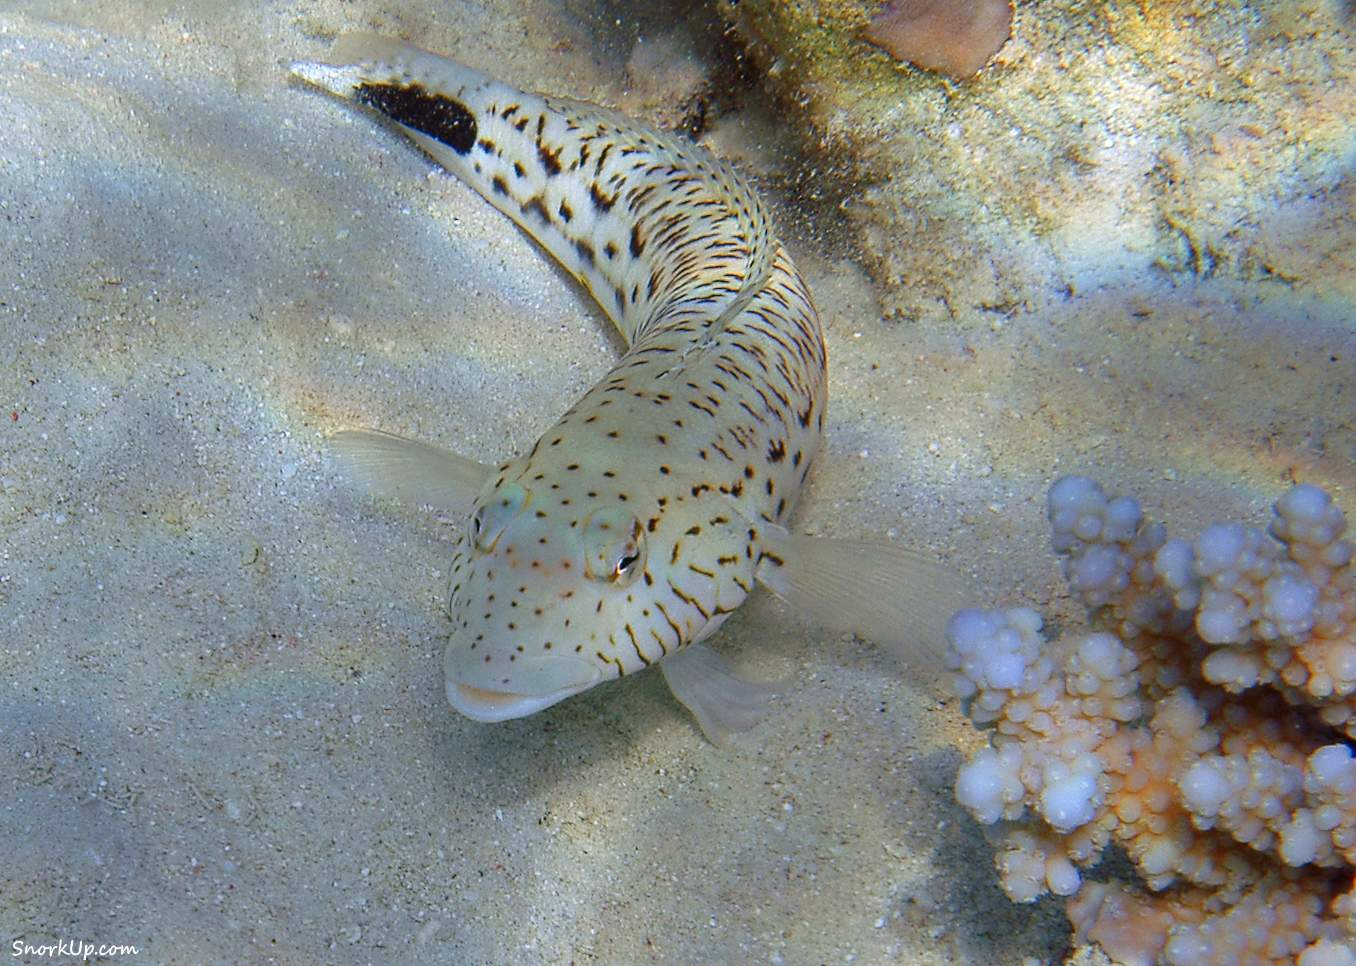 Песочник глазчатый (лат.Parapercis hexophtalma, анг.Speckled sandperch)